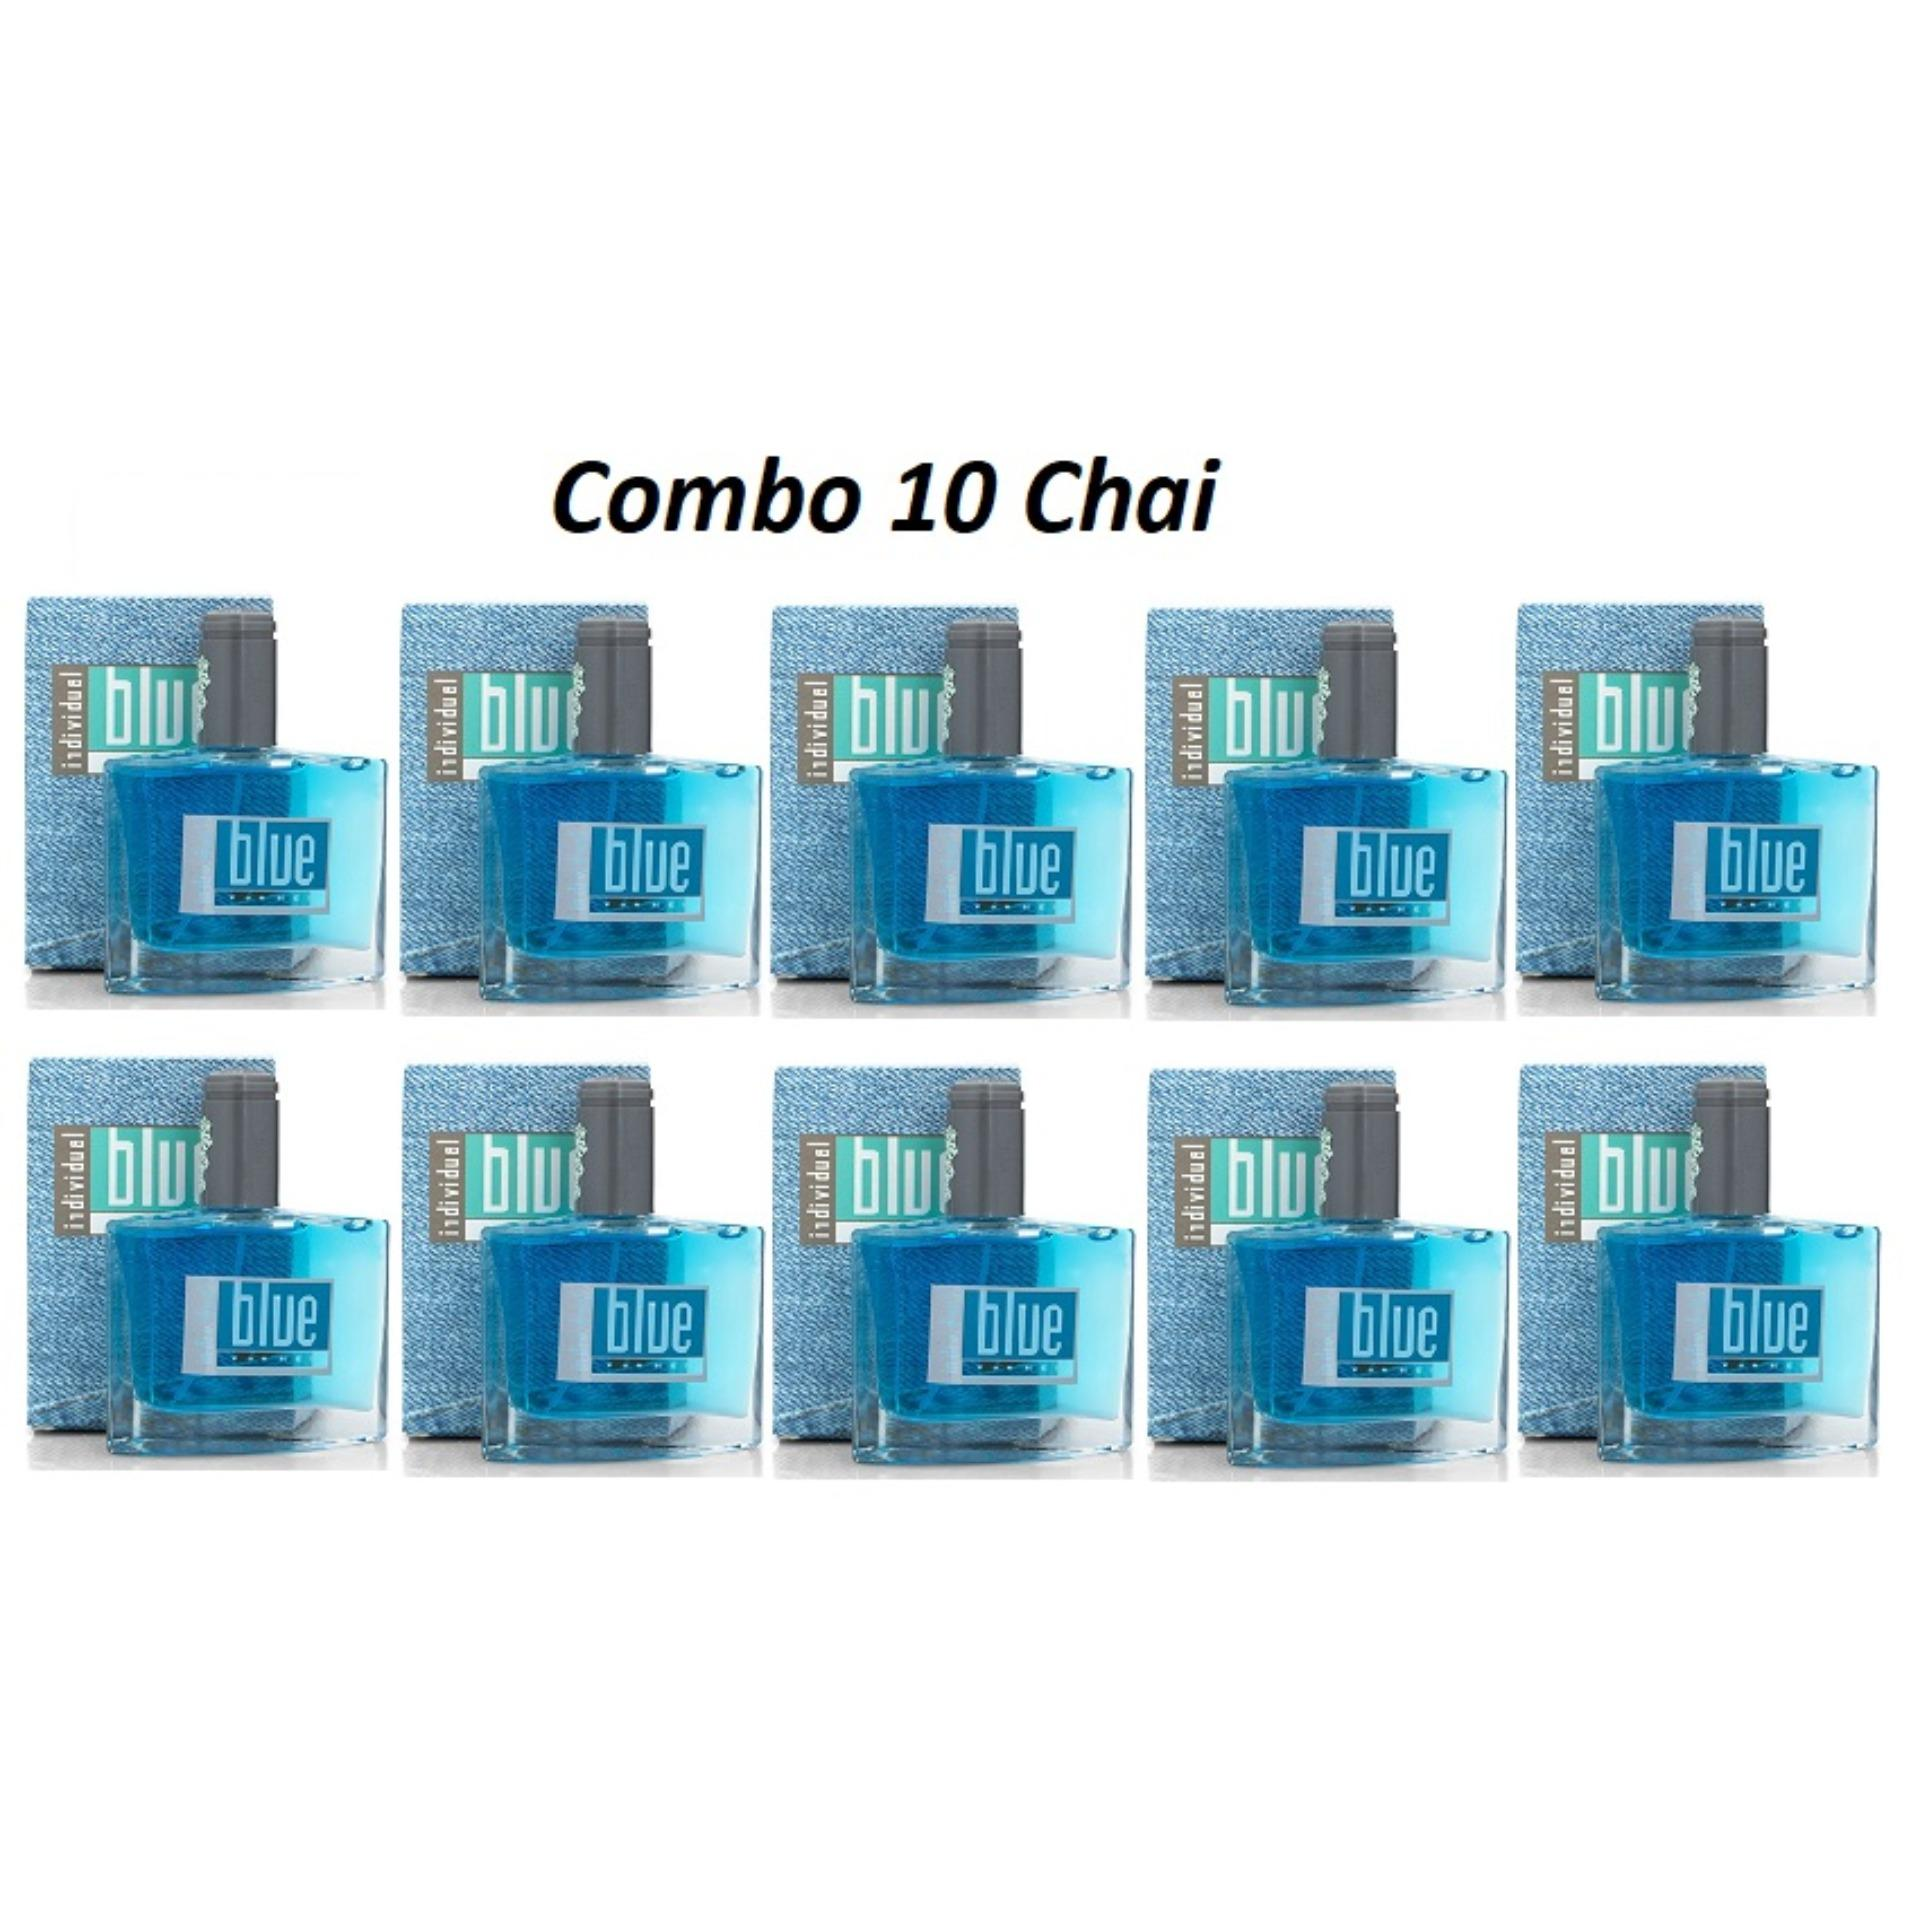 [Combo sỉ] 10 Chai Nước Hoa Nữ Blue For Her 50ml